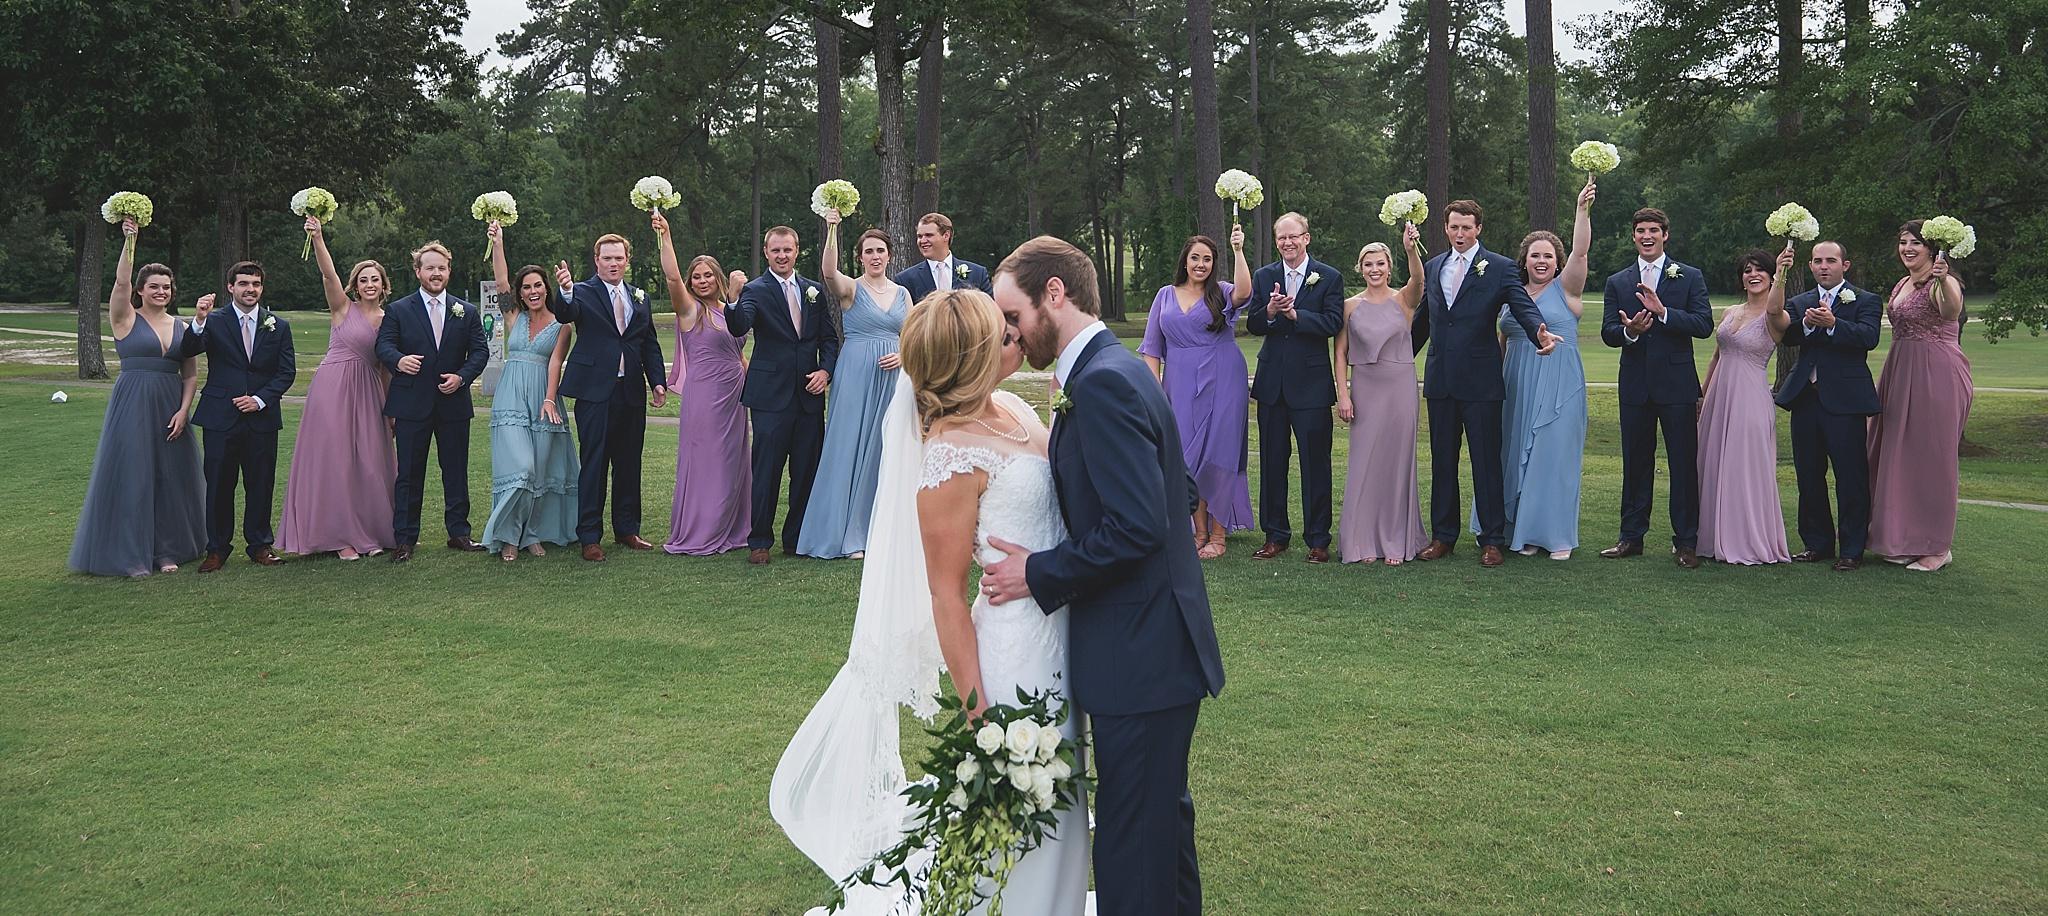 Williamston-NC-Wedding-Photographer-028.jpg